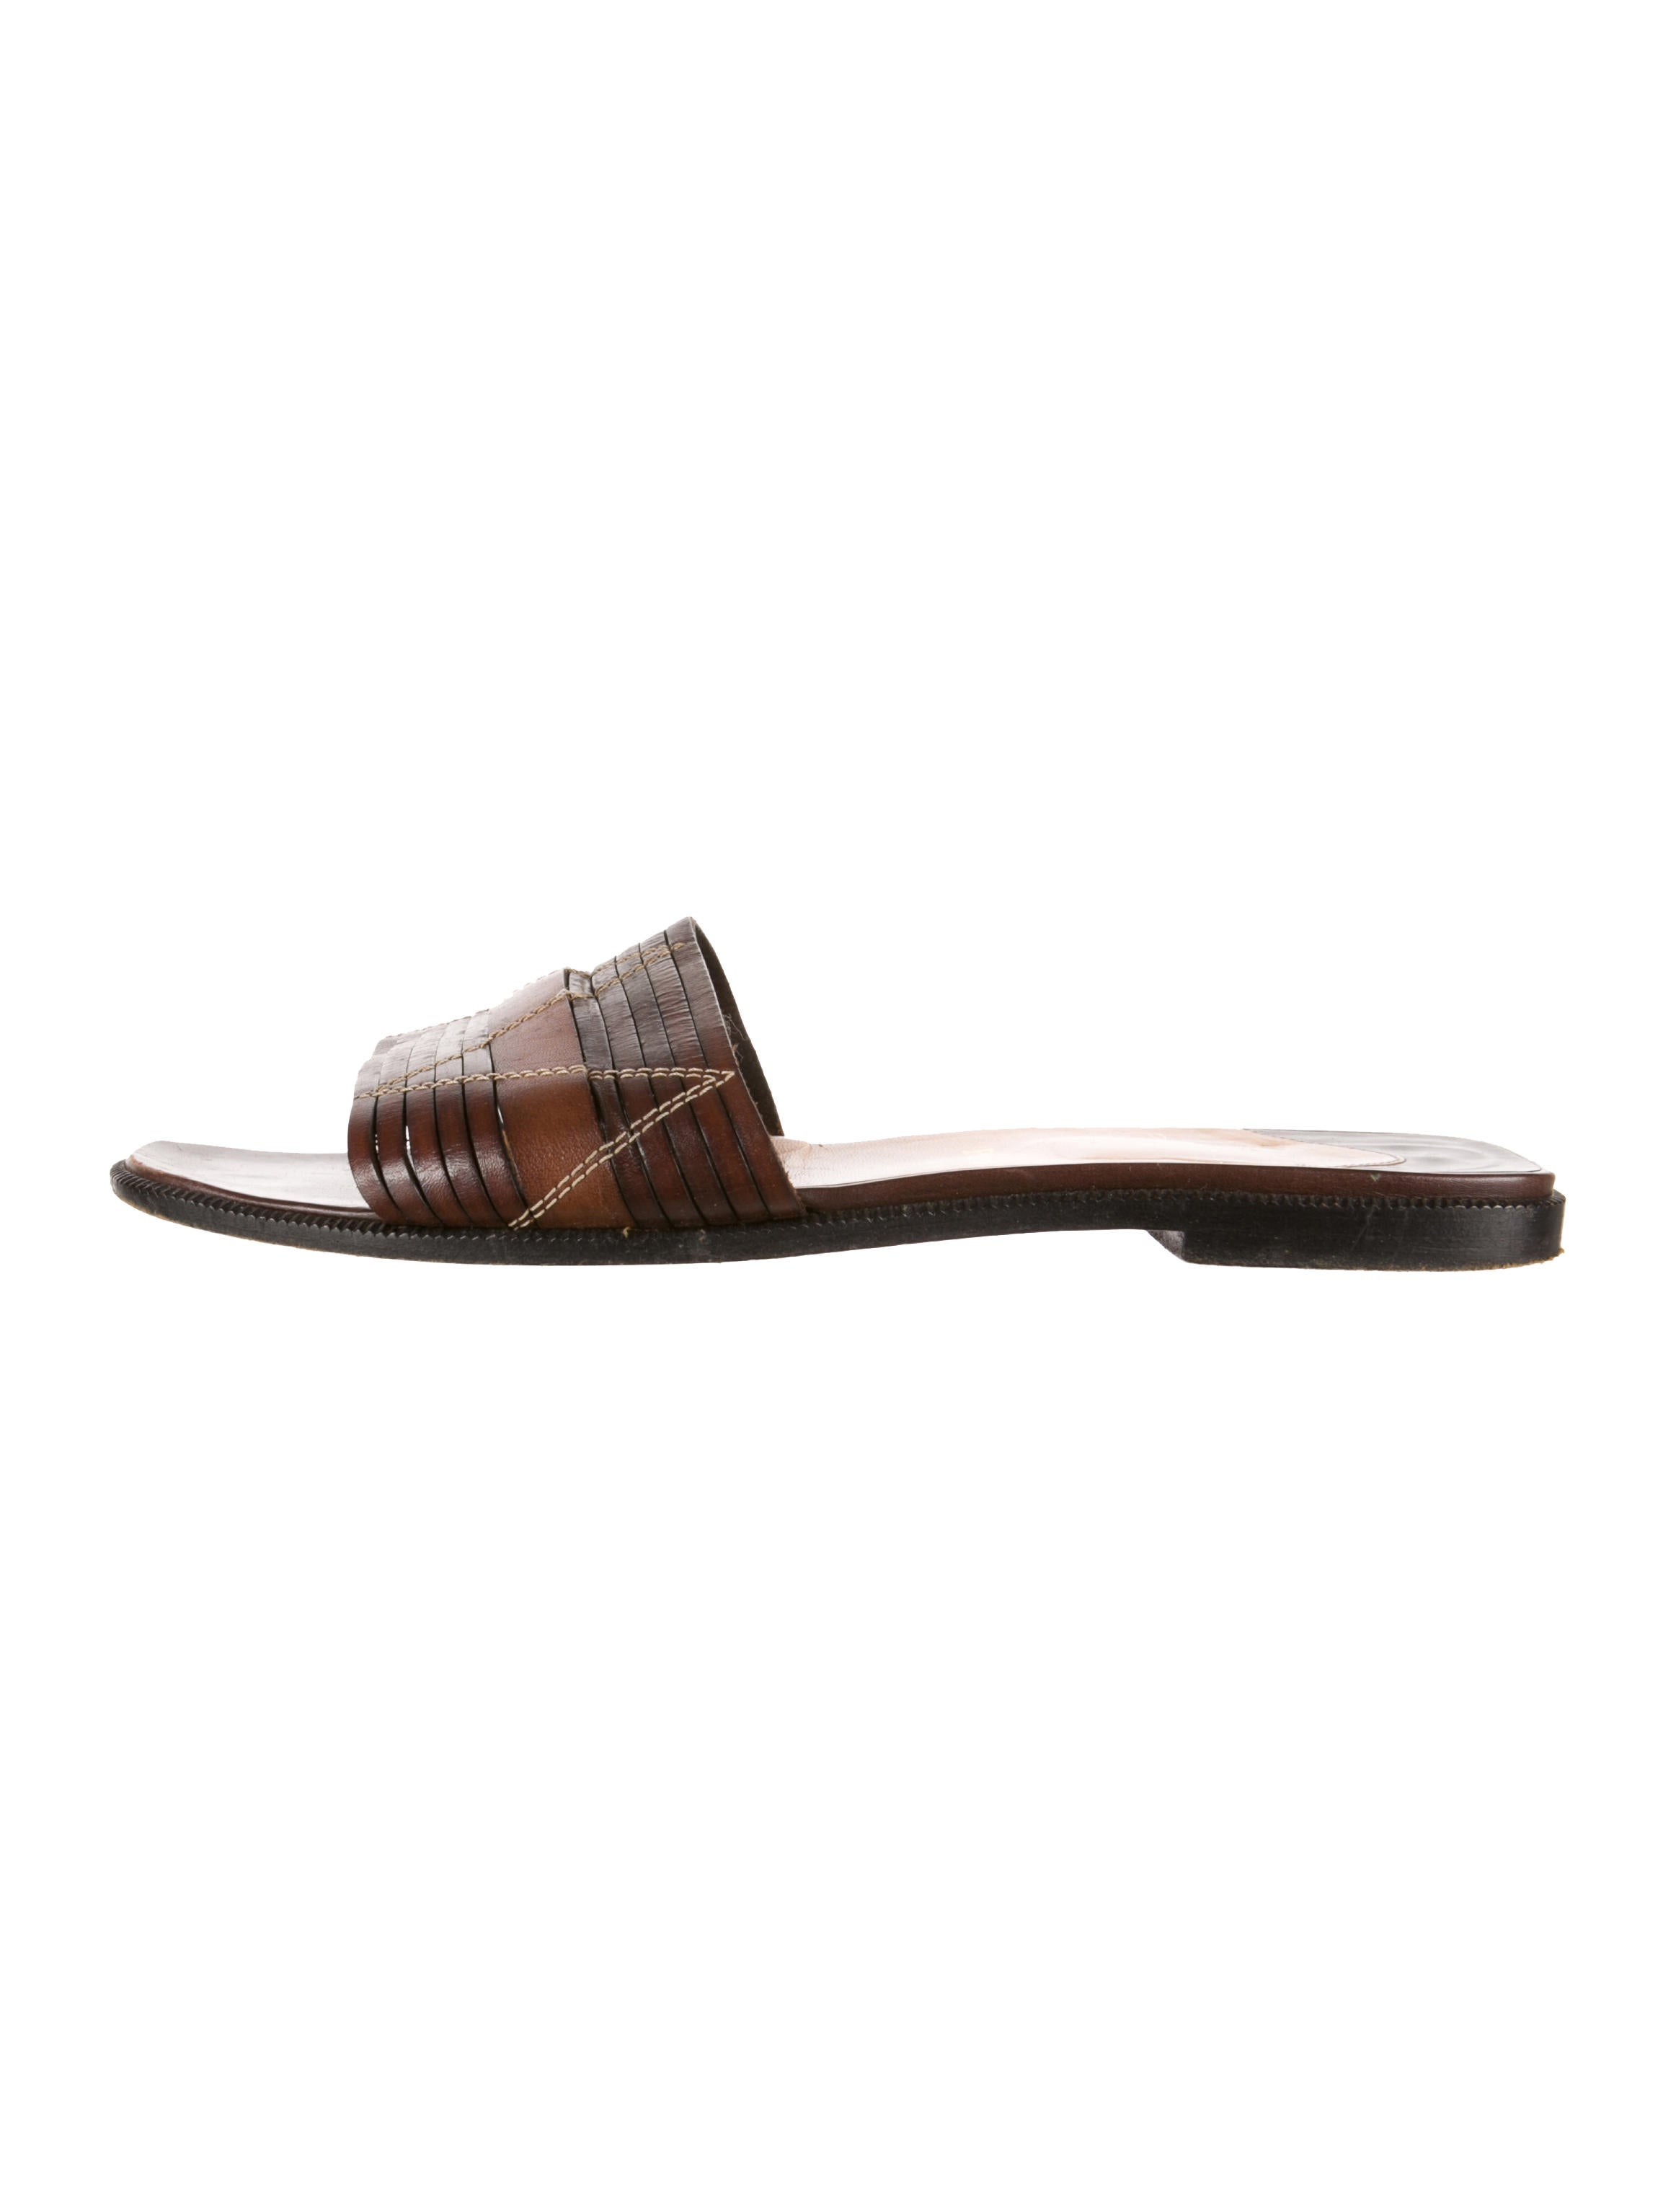 Artesur ? christian louboutin leather slide sandals Dark brown and ...